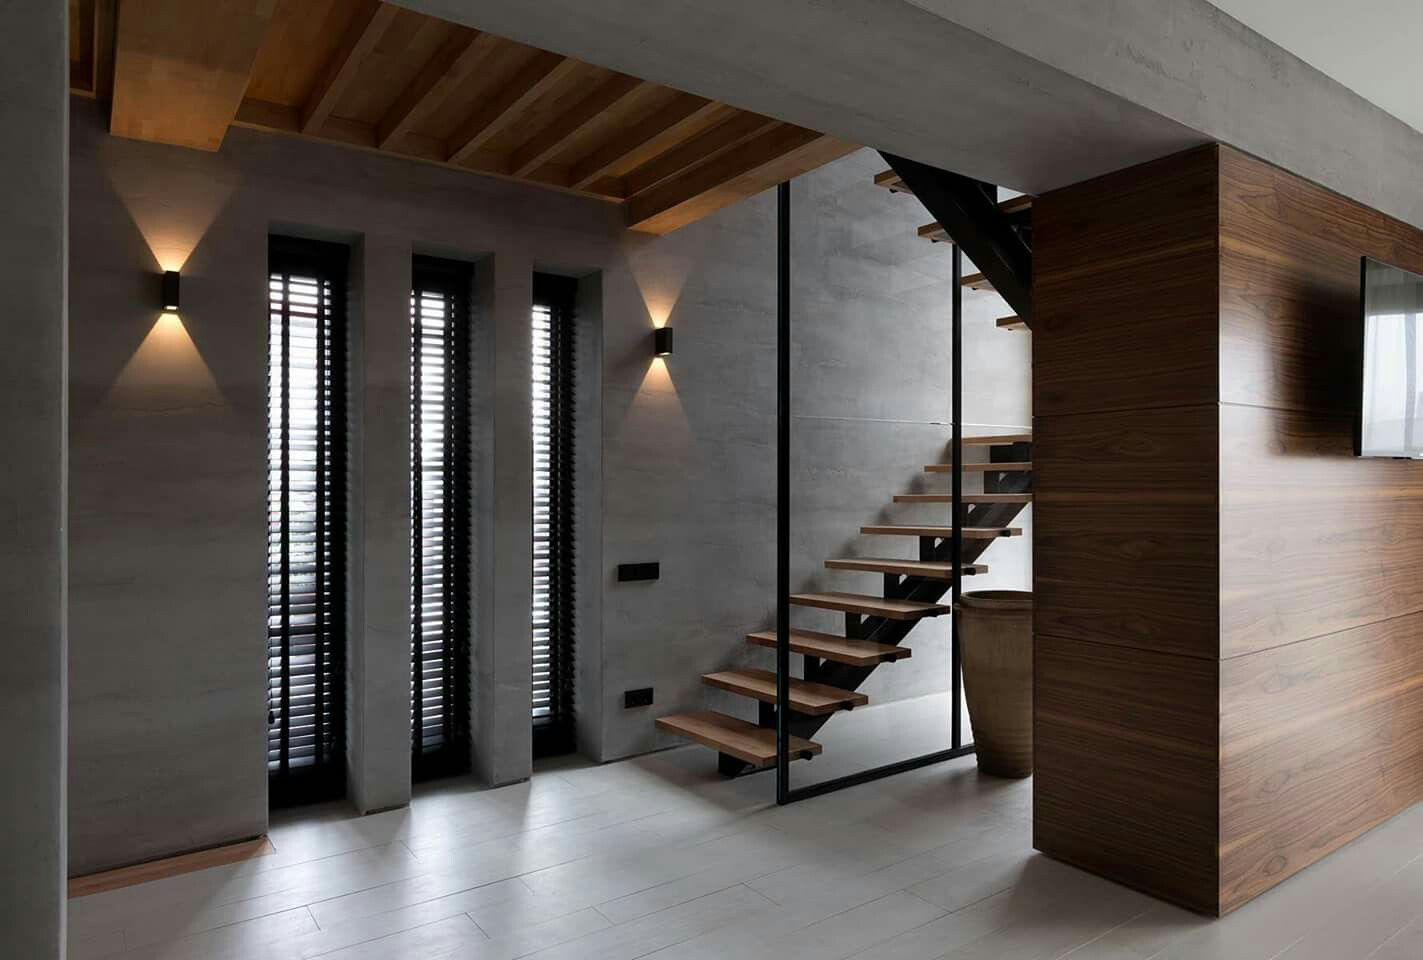 внутренняя отделка бетонного дома